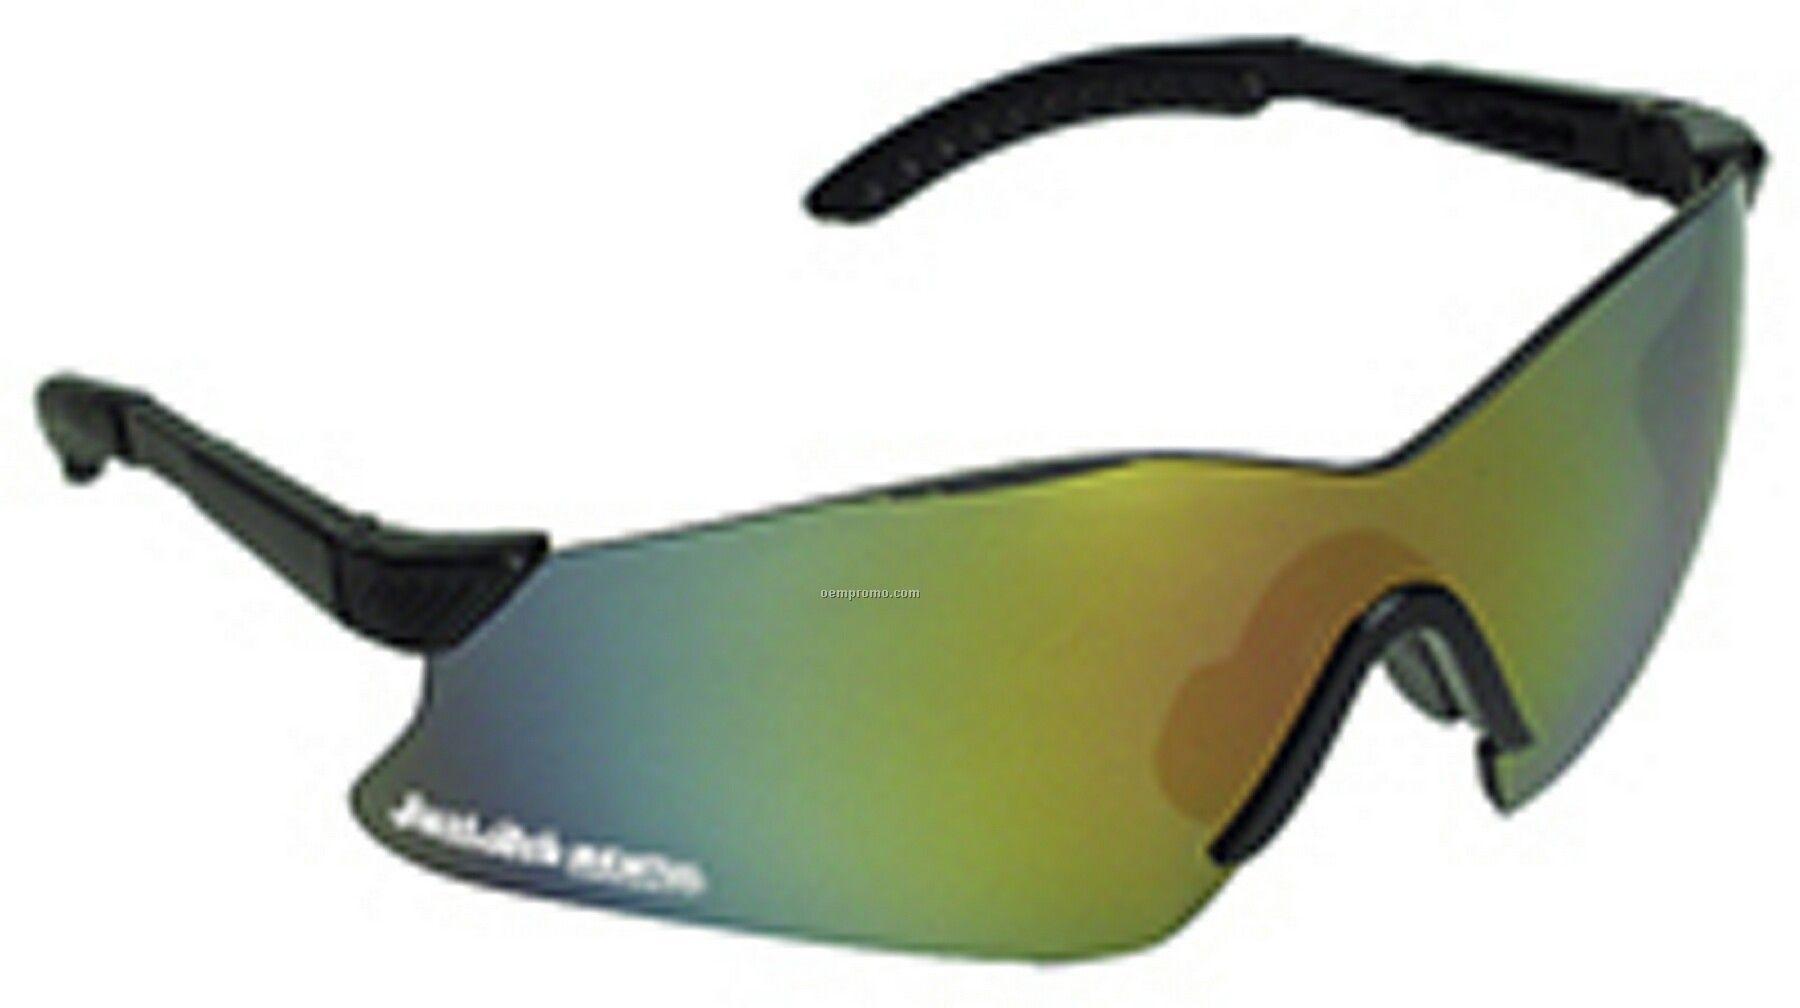 16e92c8b95 Uvex Hawk Sunglasses Review